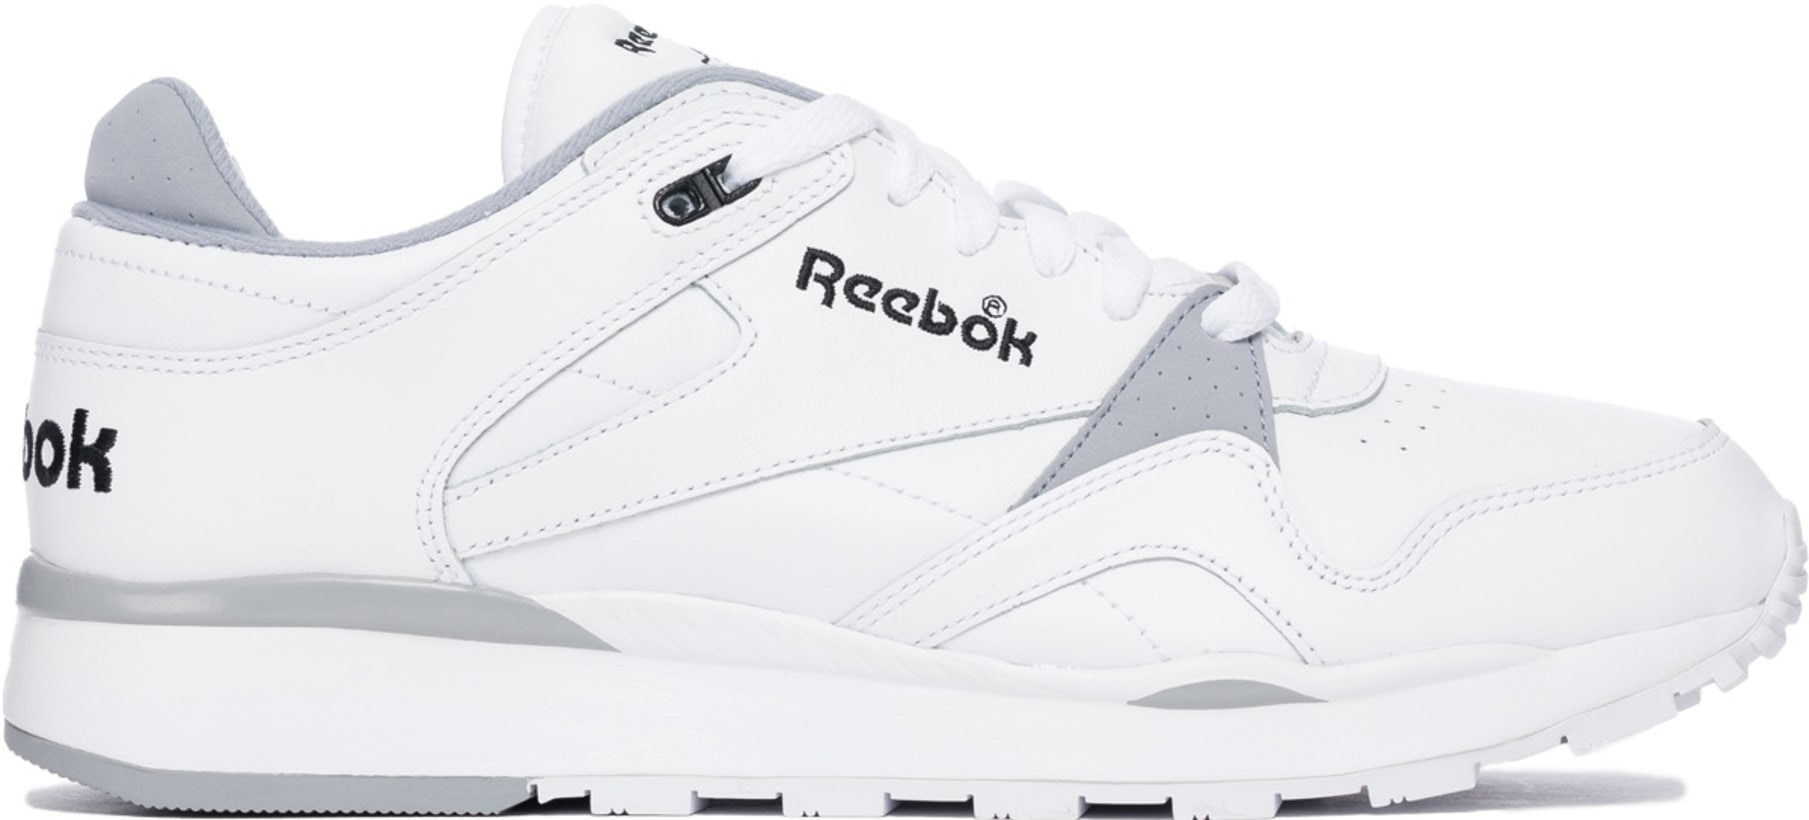 0b368078e48 Reebok  Classic Leather II - White Cool Shadow Black